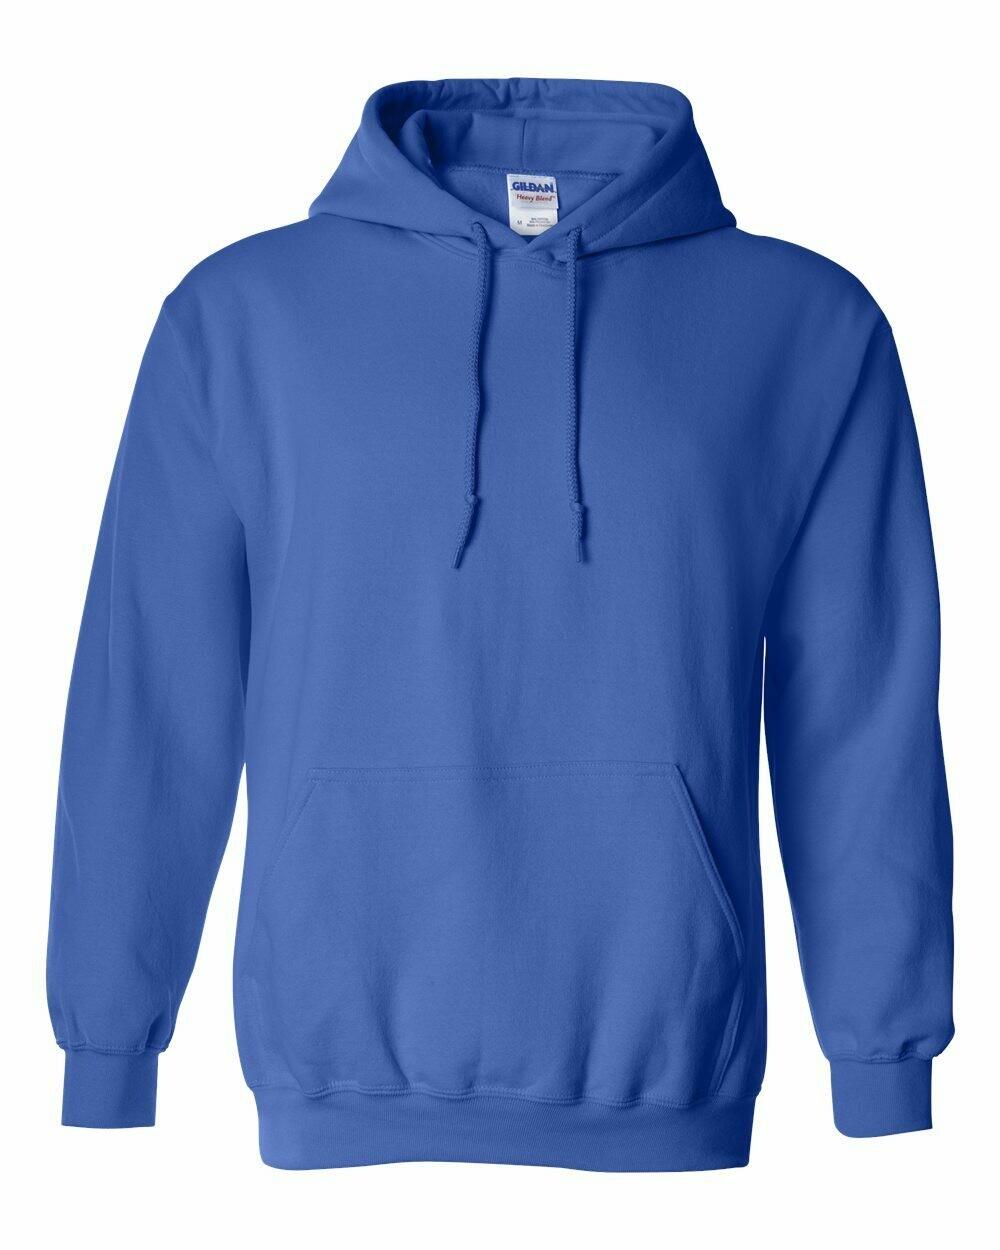 Adult Gildan Heavy Blend Hooded Sweatshirt - (LPCS)